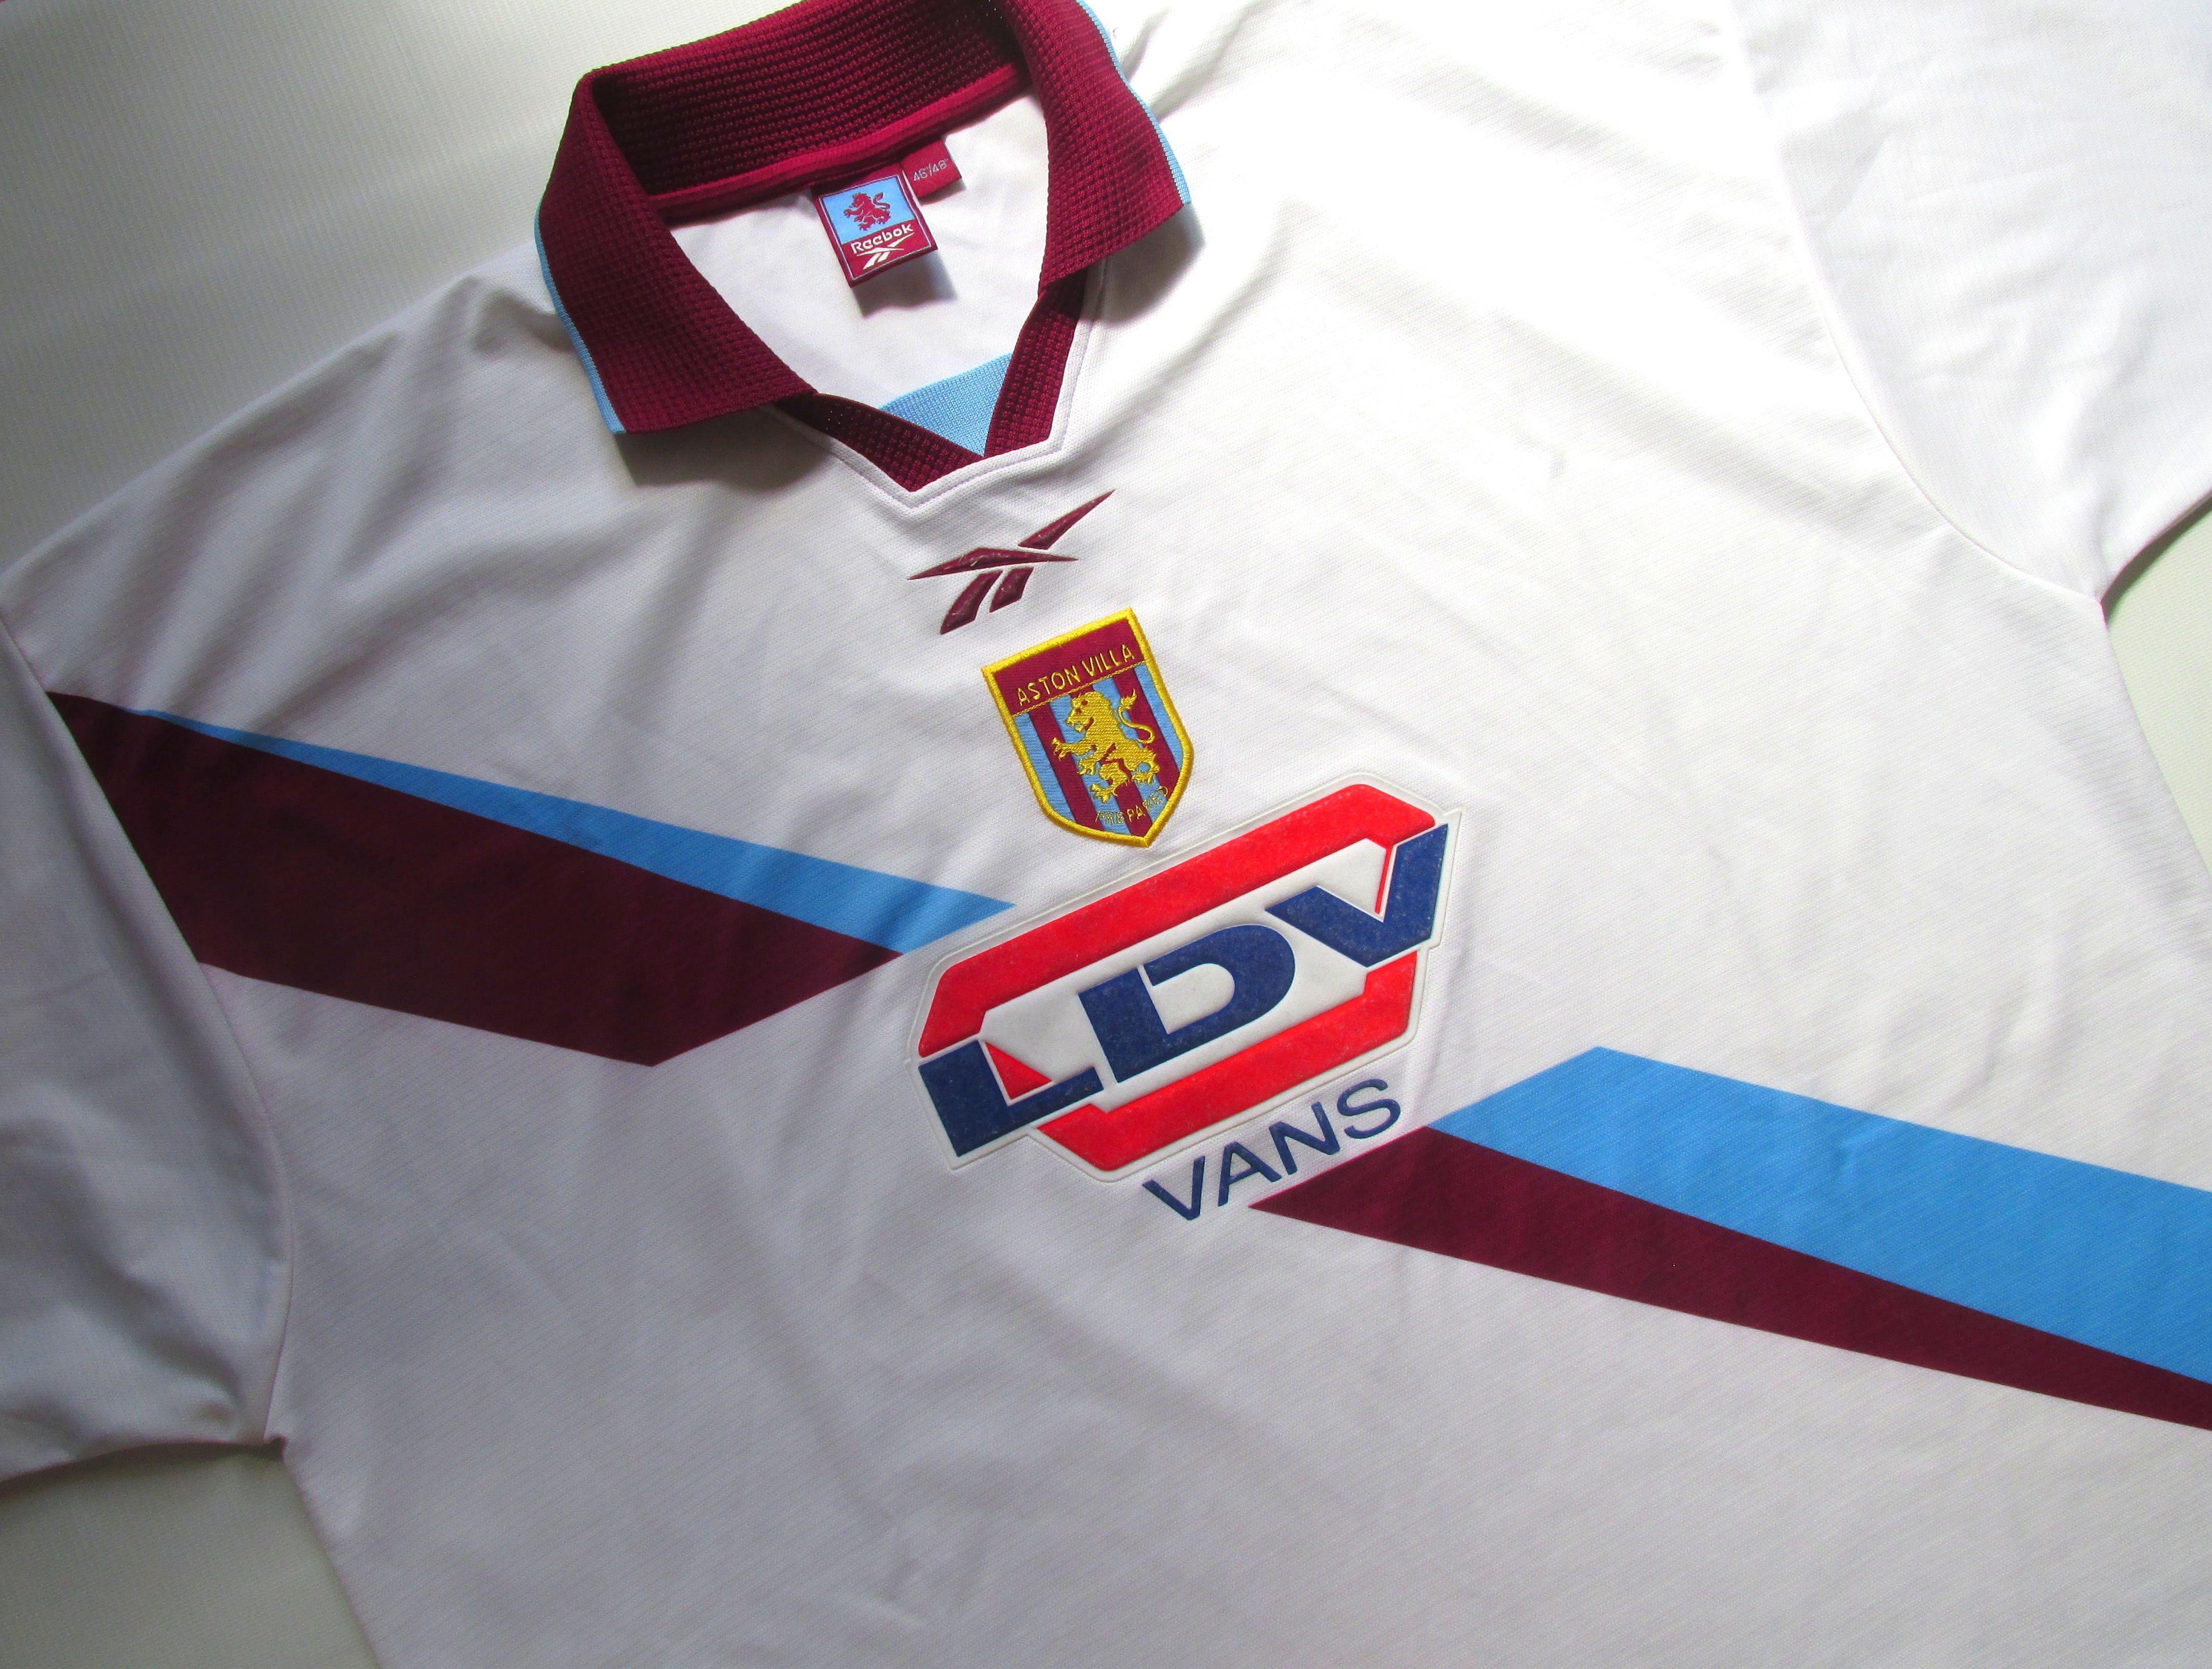 Aston Villa 1999 2000 Away Football Shirt By Reebok In 2020 Football Shirts Vintage Football Shirts Soccer Jersey